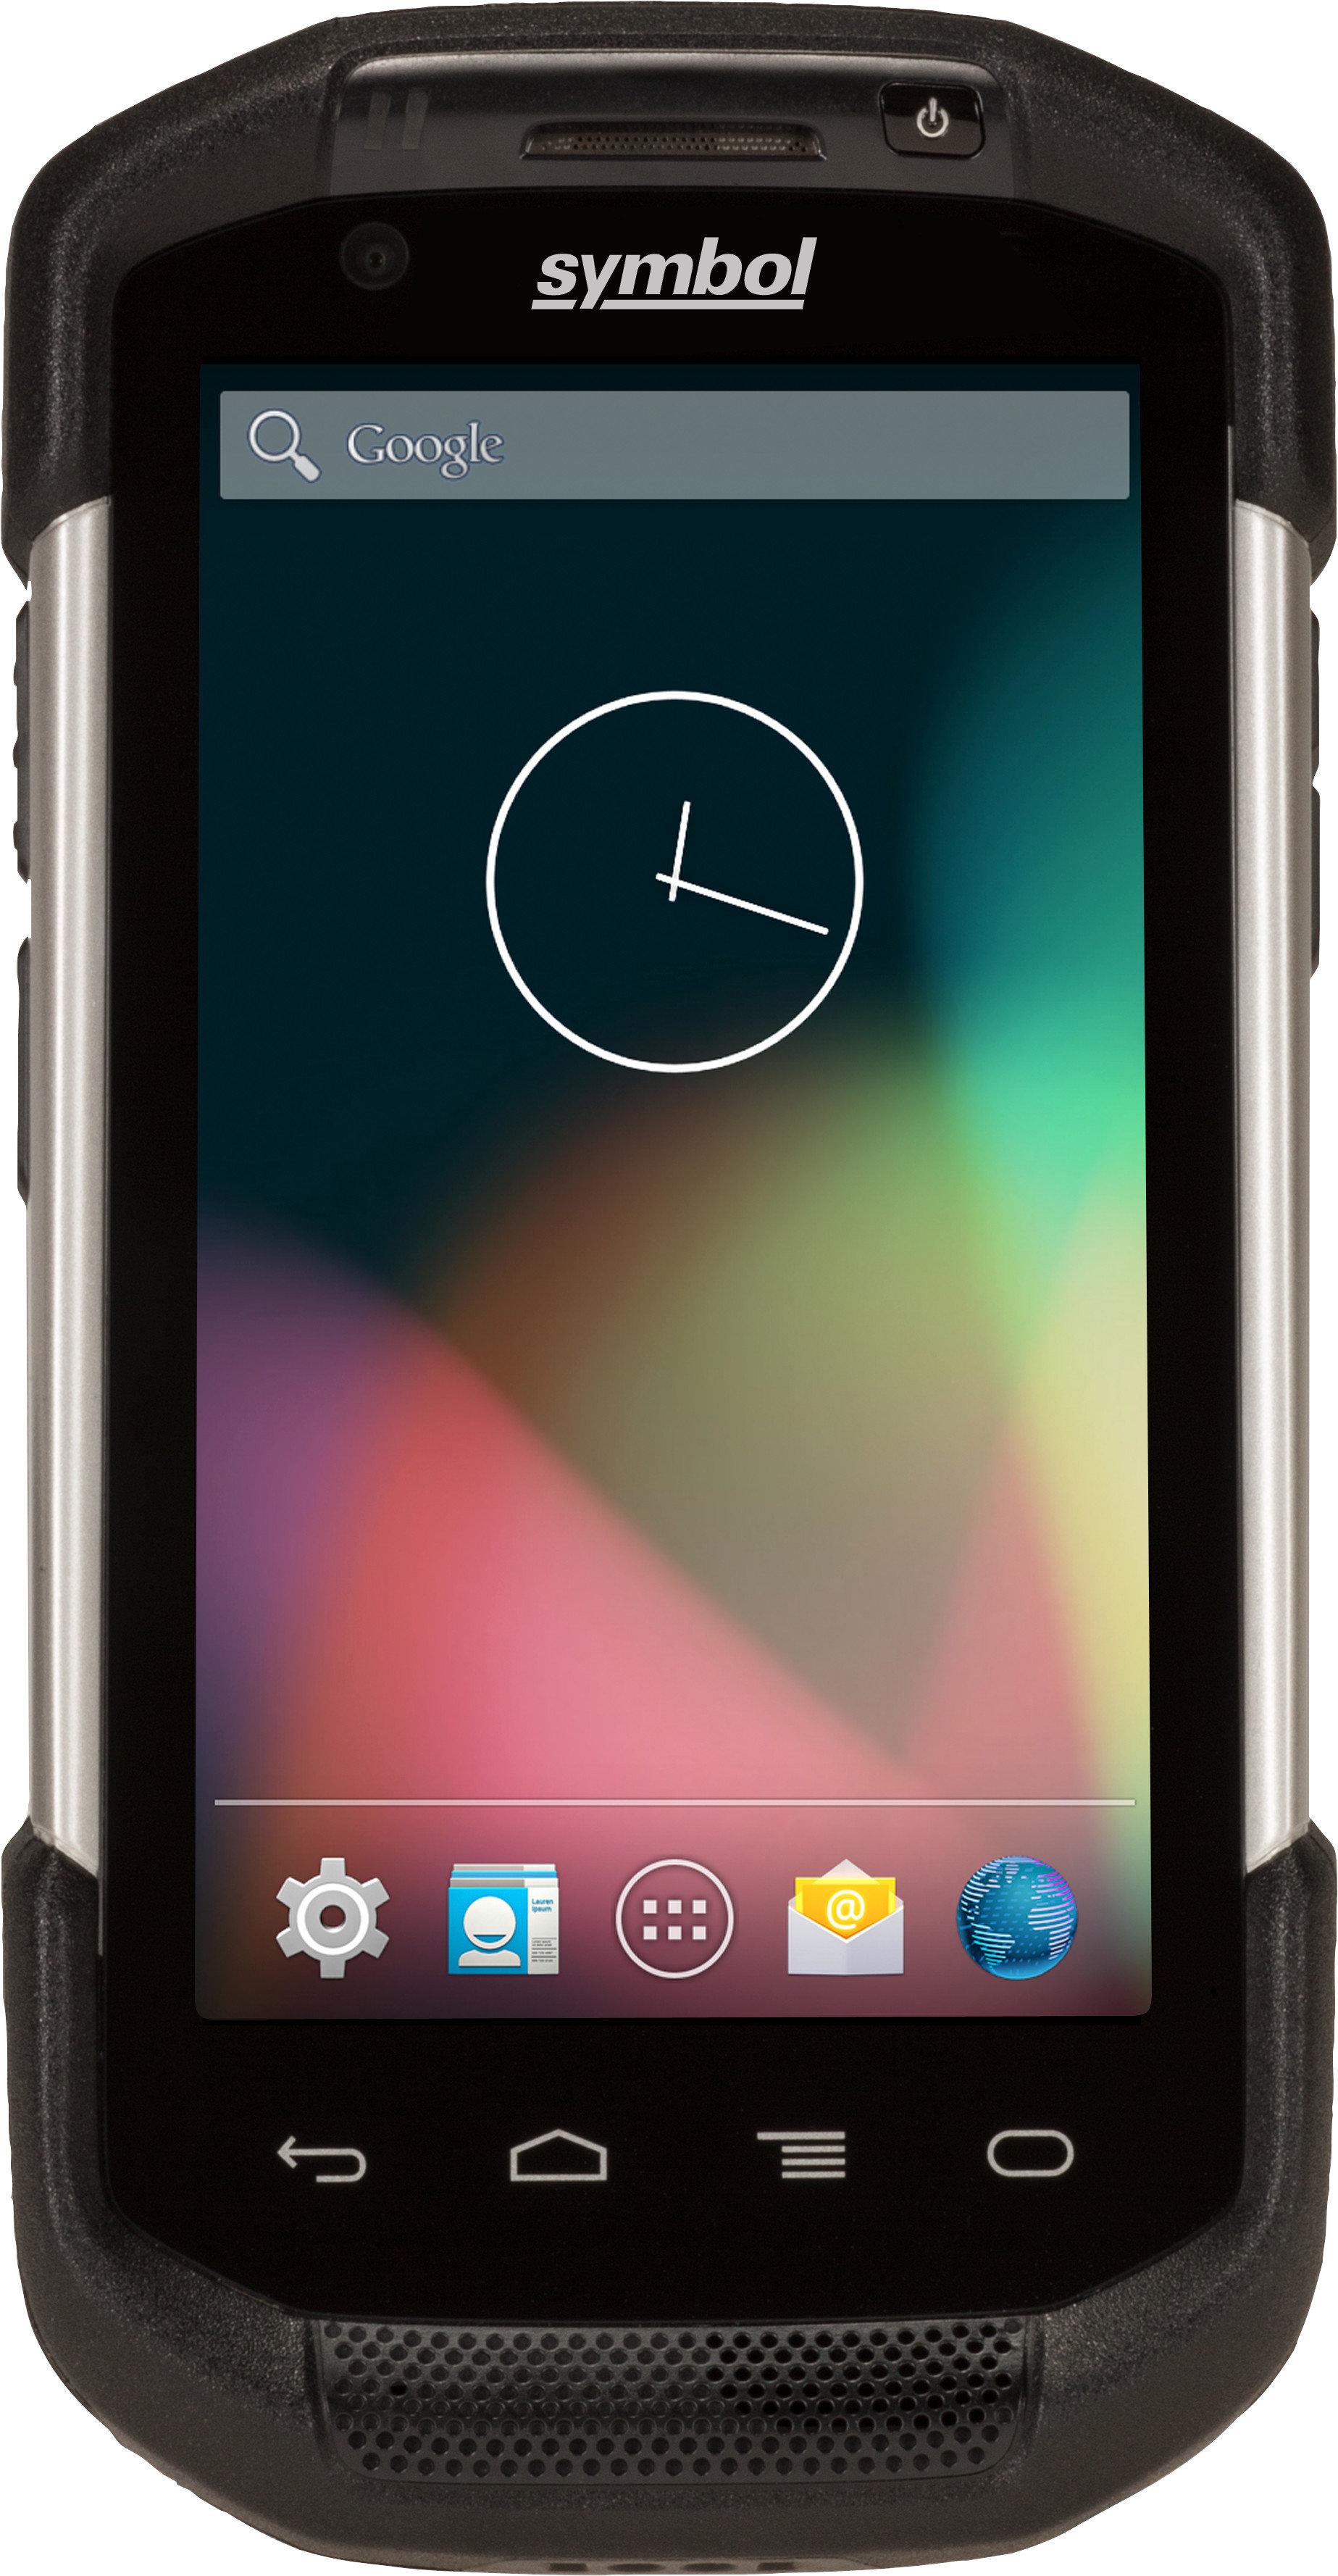 Терминал Zebra TC70; 2D; WiFi, Bluetooth, NFC, Android 4.2.2, стандартная батарея, 2 камеры, TC700H-KC11ES-IN